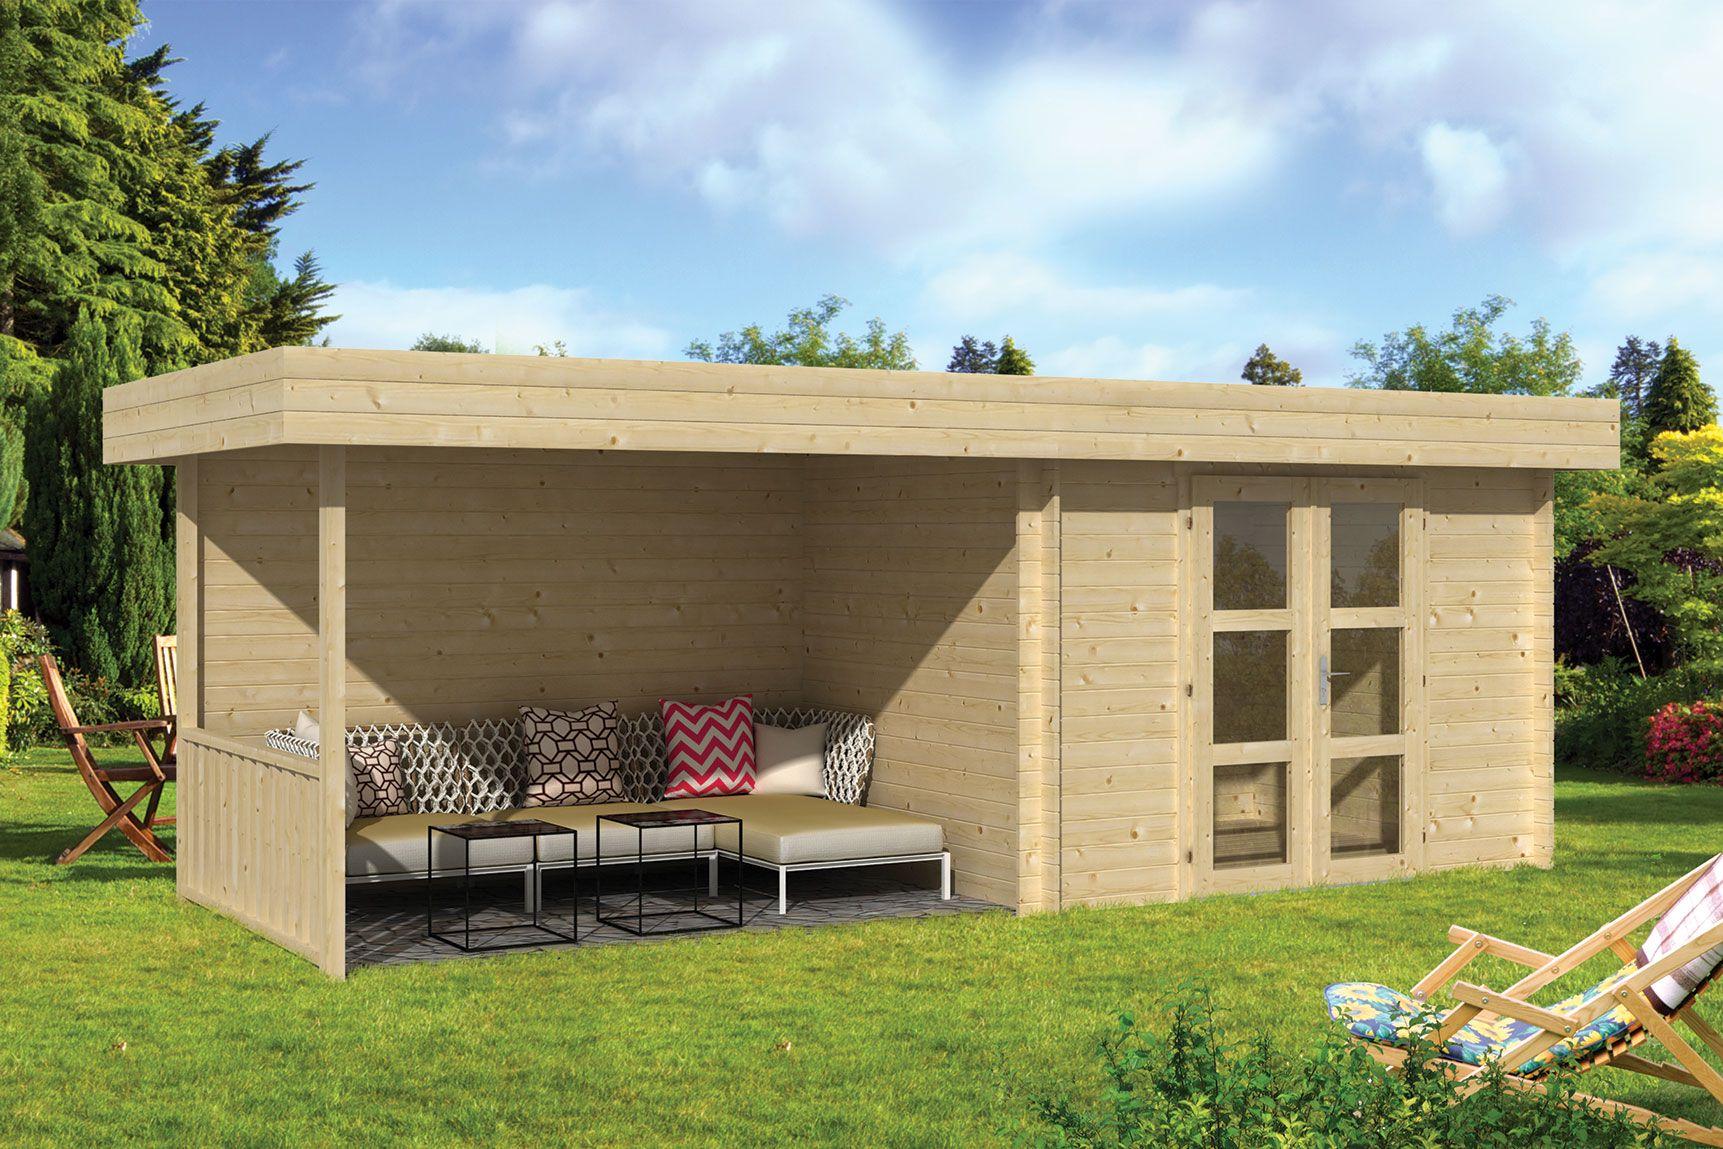 Kosten overkapping hout good lariks veranda bouwpakket Erhardt markisen kosten